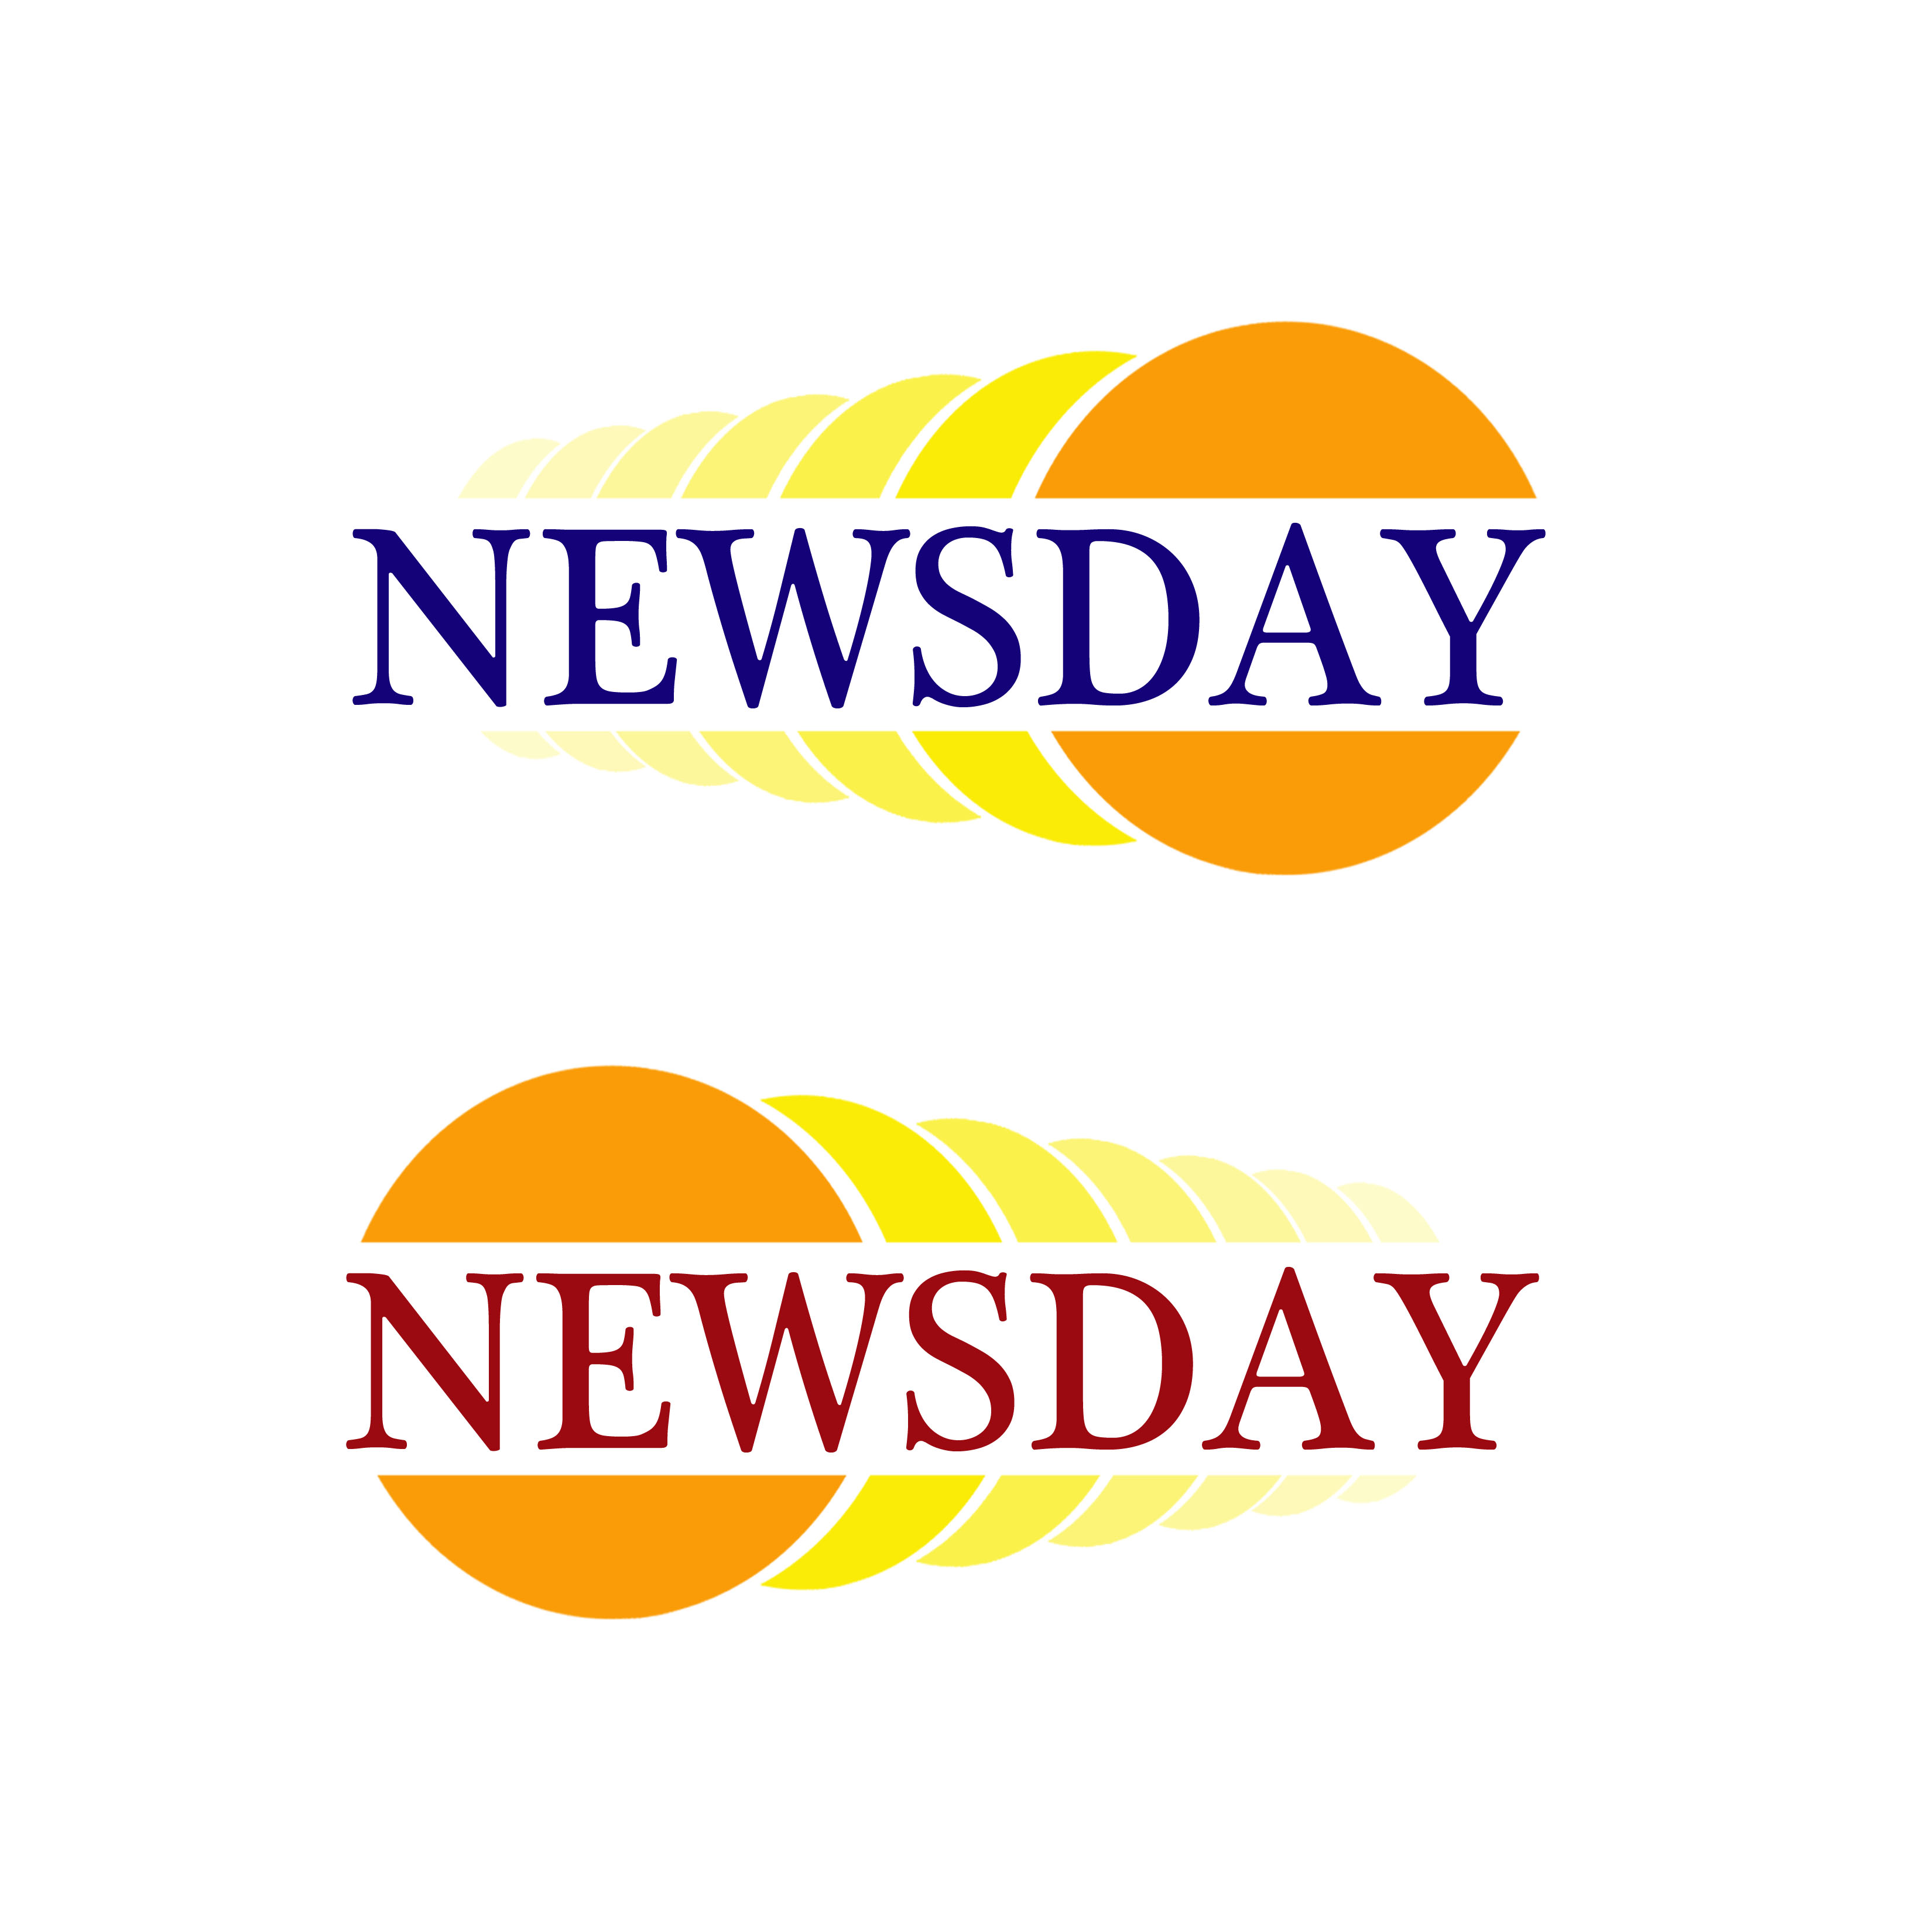 Logo Design by Allan Esclamado - Entry No. 79 in the Logo Design Contest Artistic Logo Design for Newsday.